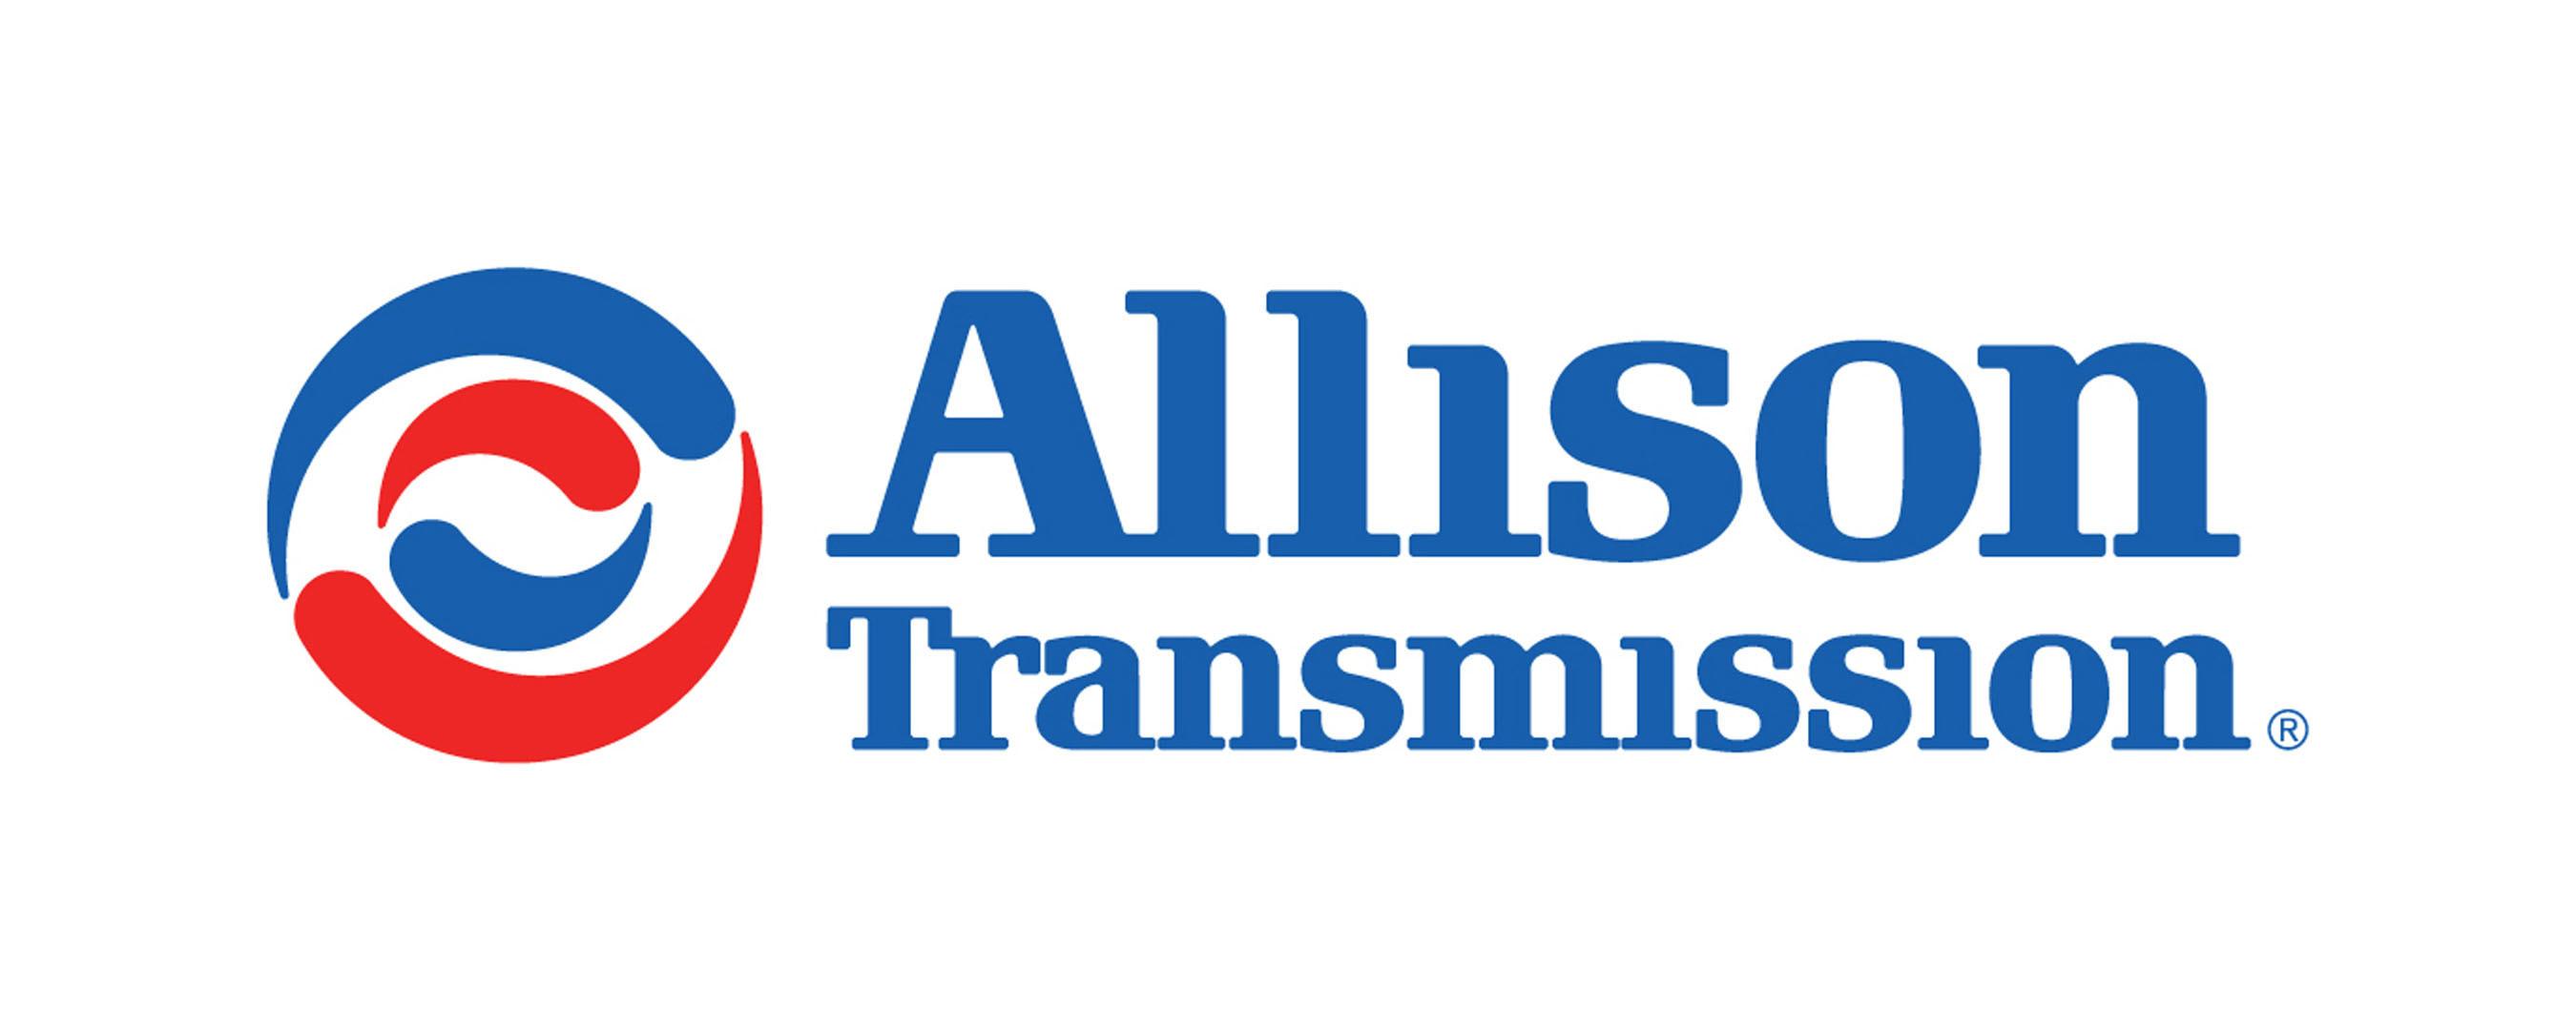 Allison Transmission Inc. logo.